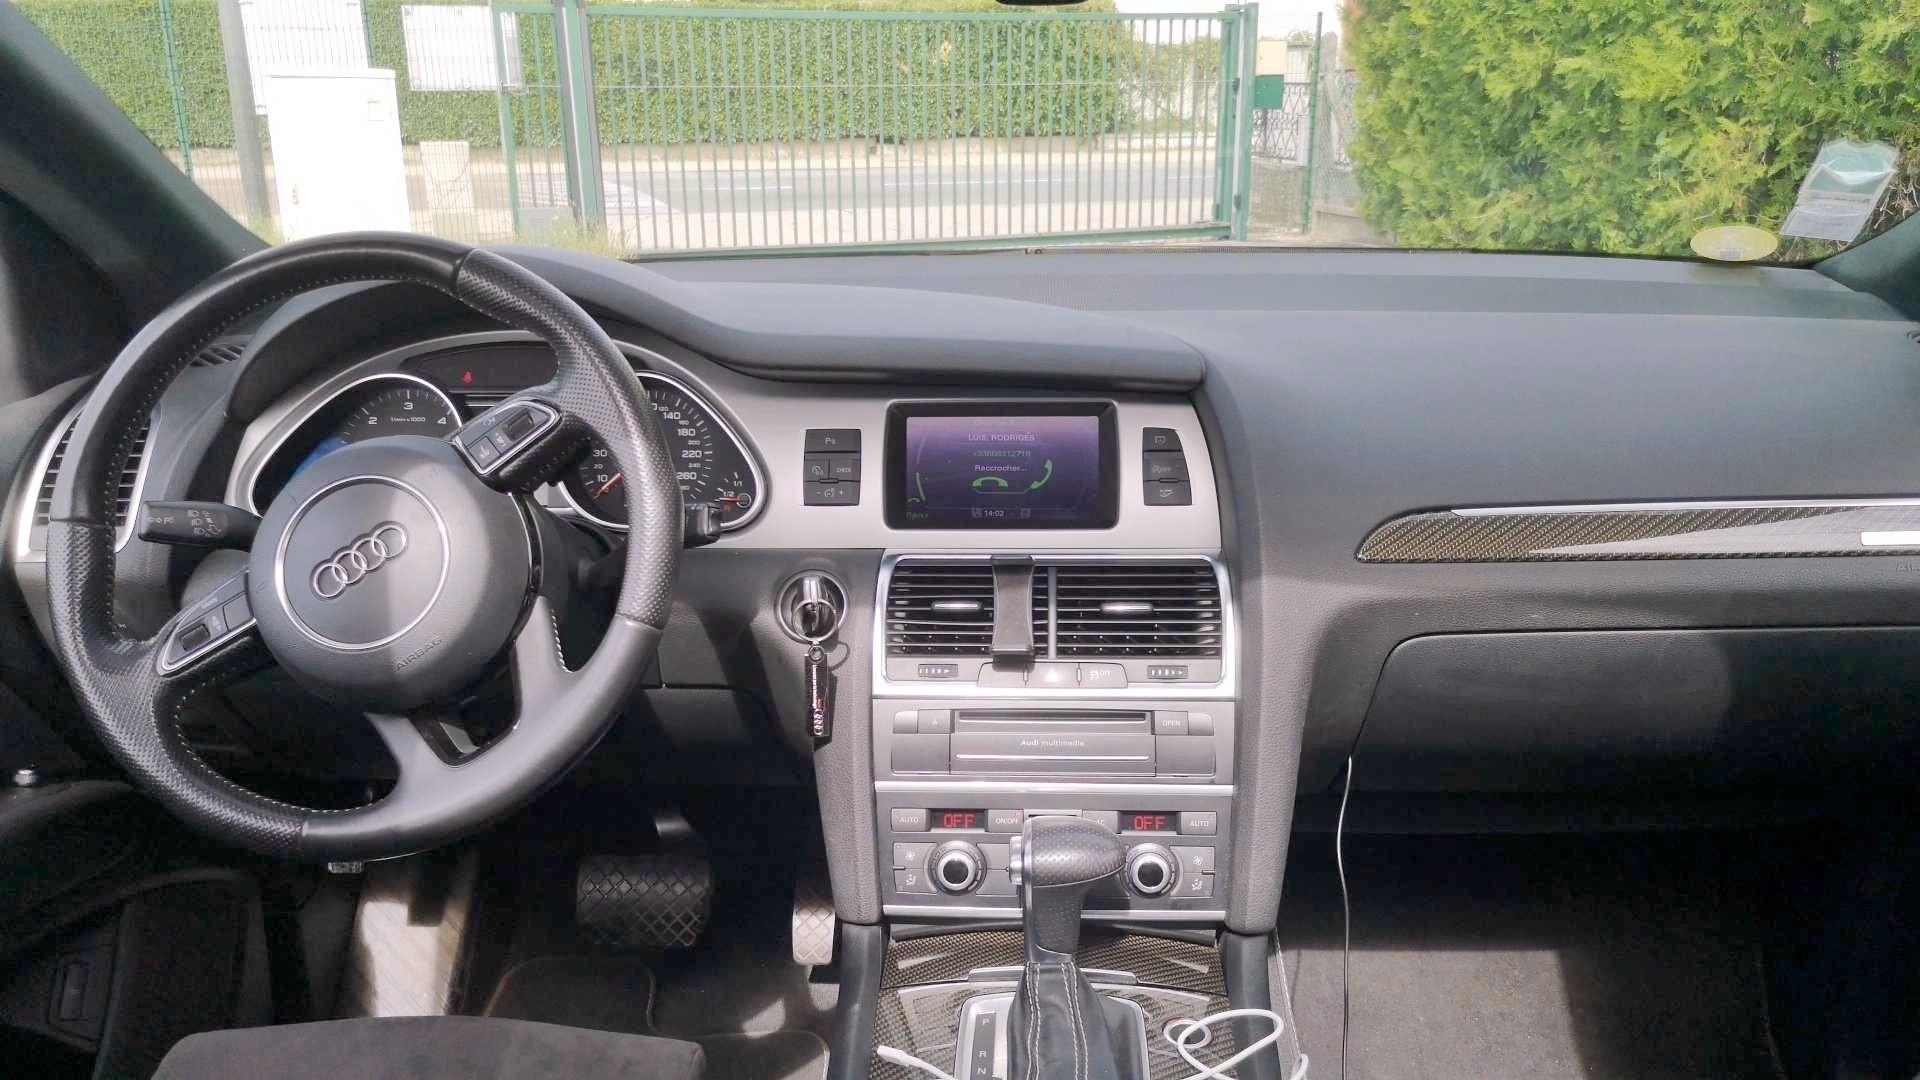 Audi Q7 D Occasion Q7 3 0 V6 Tdi 245 Dpf Quattro Ambiente Tiptronic A 7 P St Genis Laval Carizy